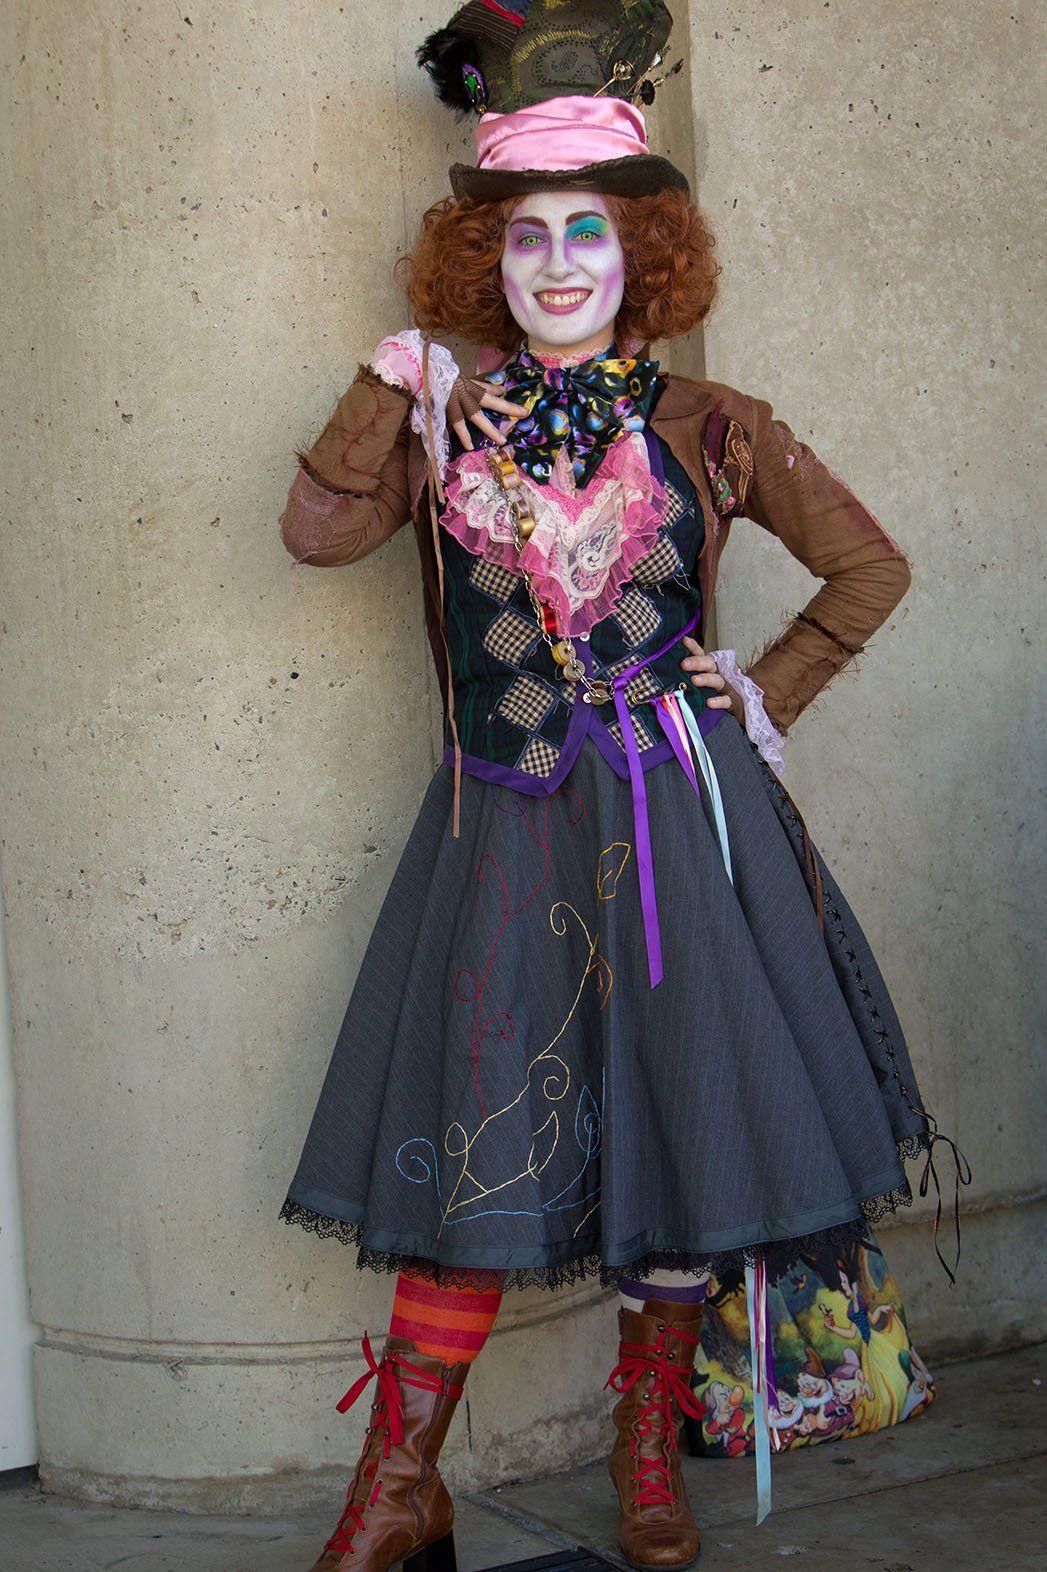 Fasching Kostume Damen Ideen Kinderschokobon Diy Tullrock Print